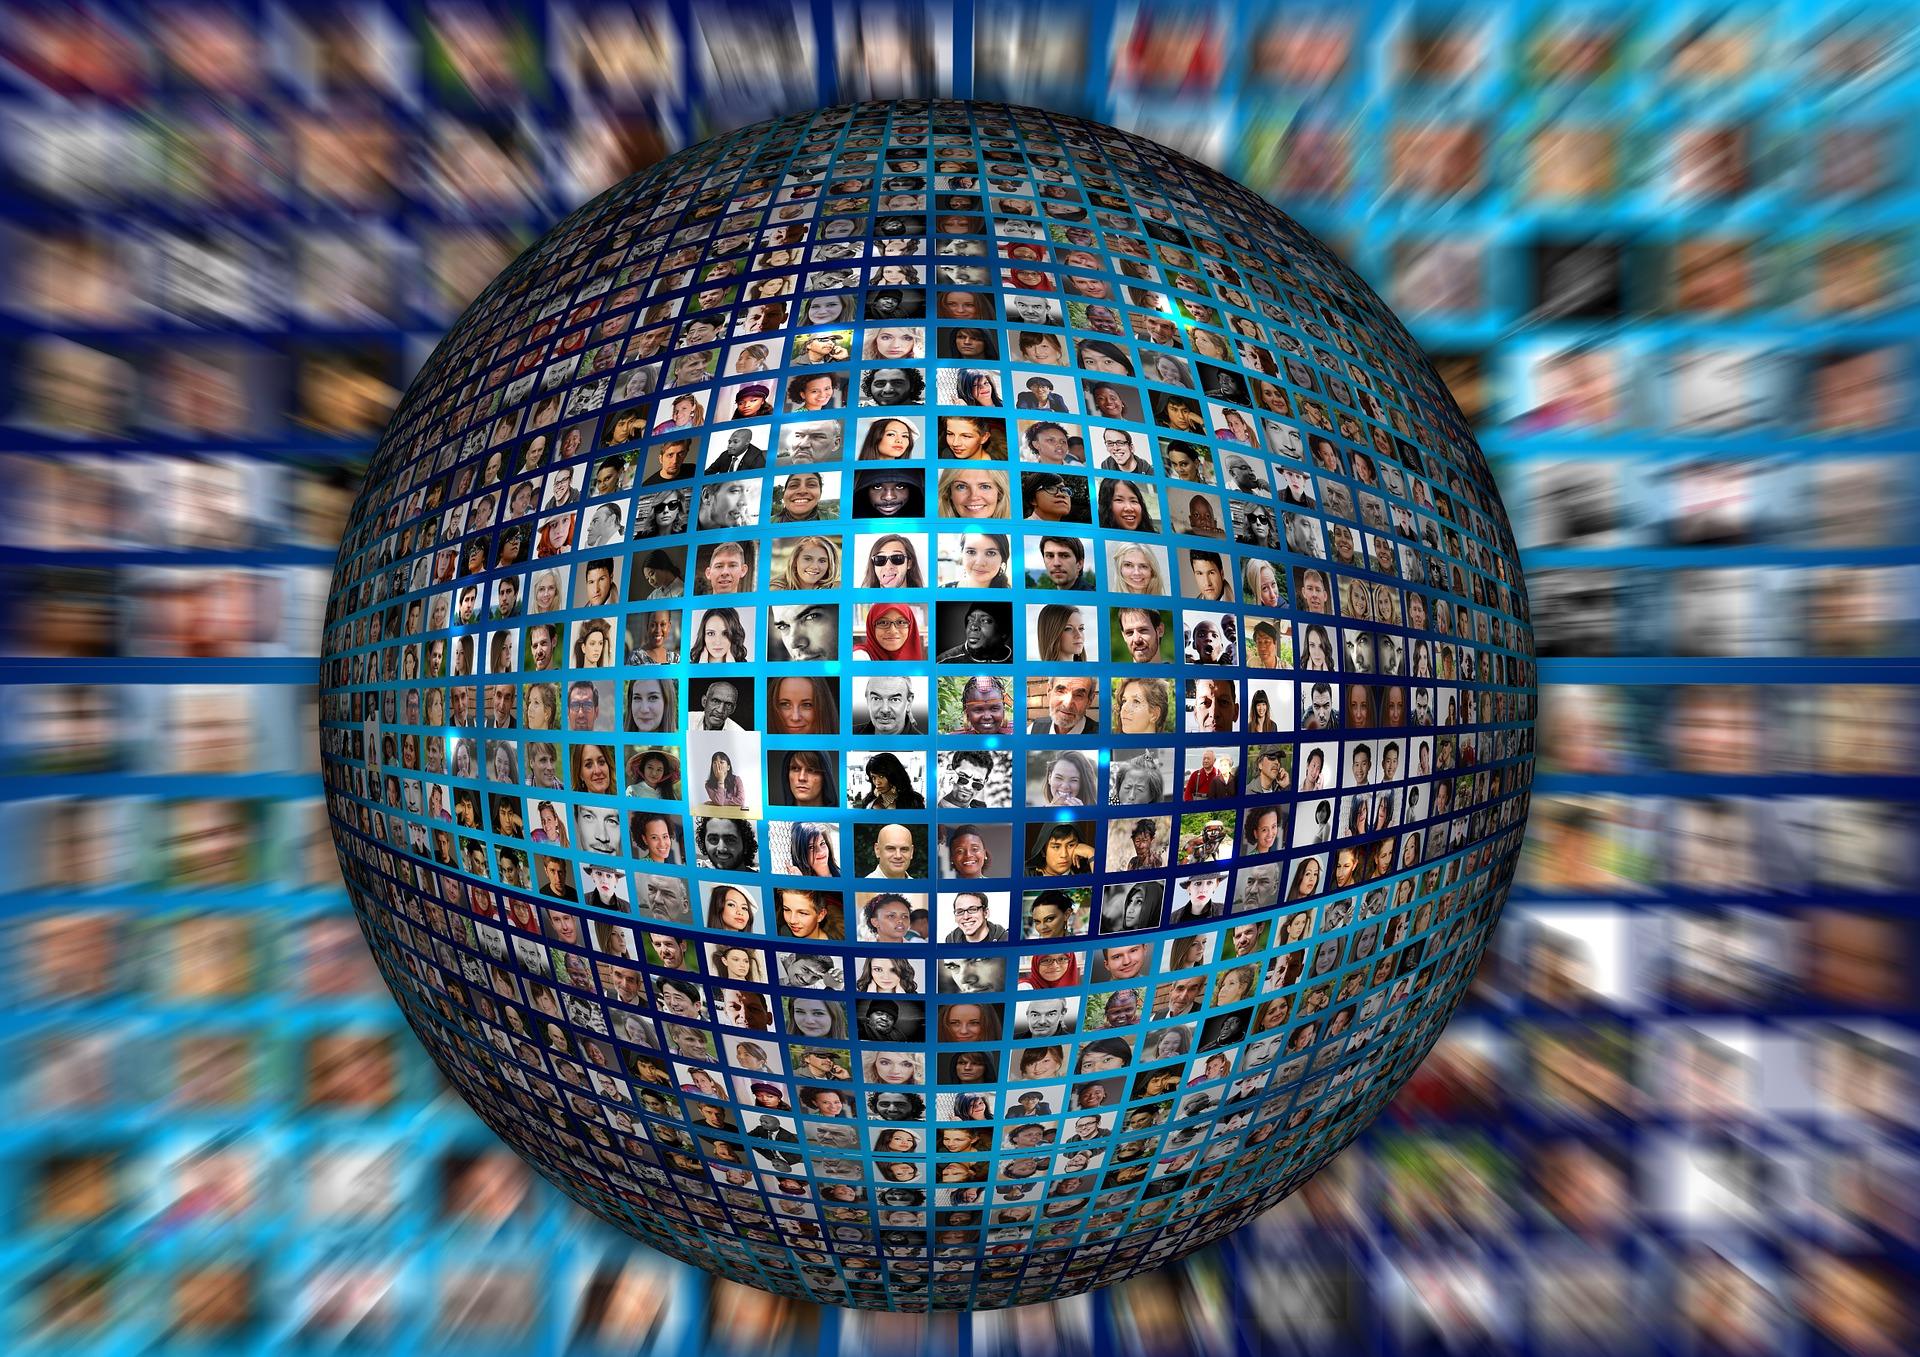 https://pixabay.com/es/humanos-se-enfrenta-a-personales-977414/